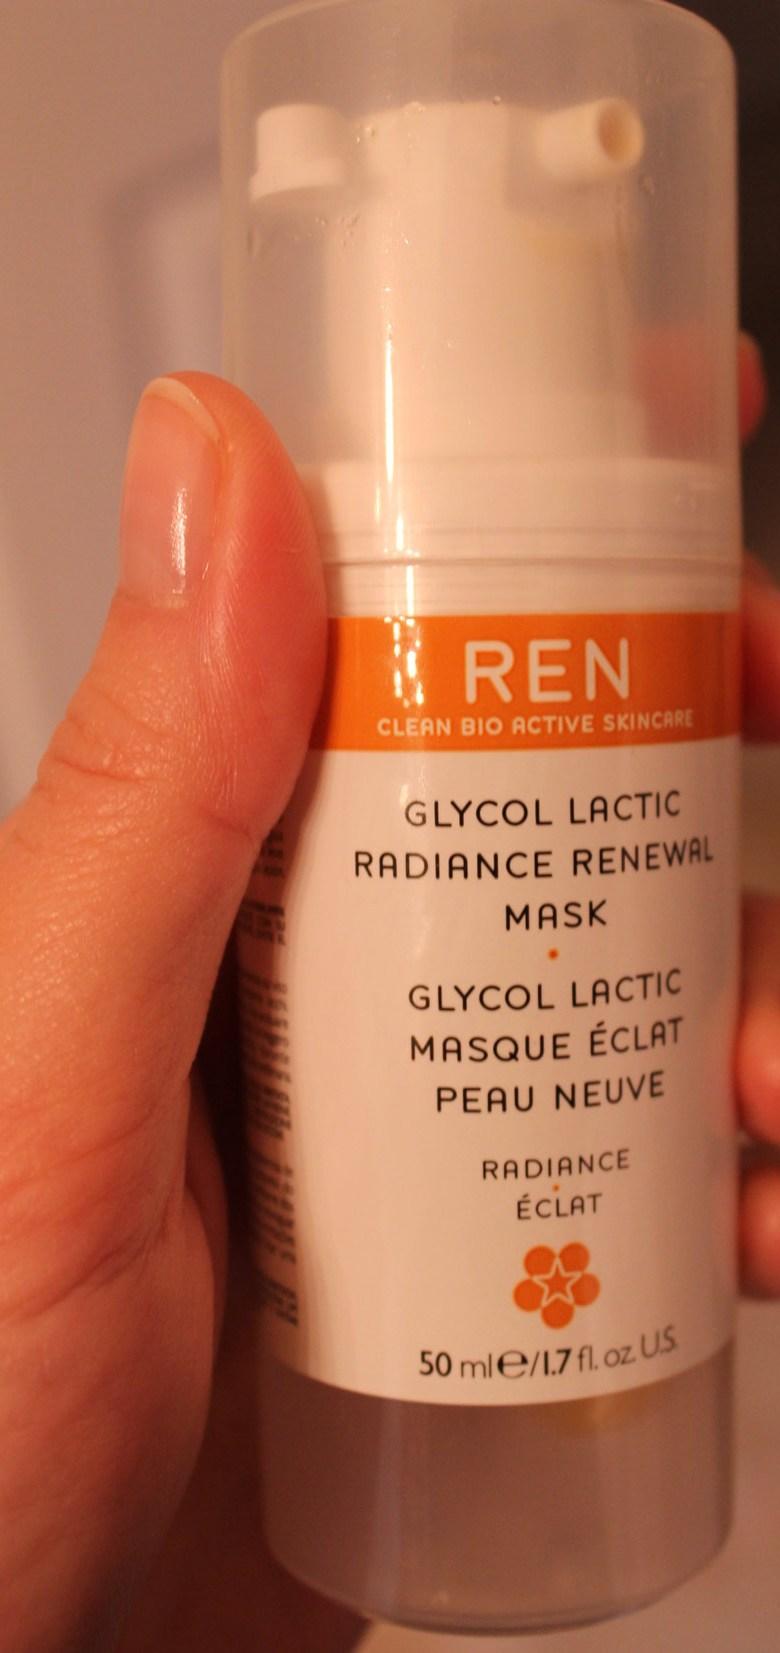 ren glycolic lactic radiance renewal mask